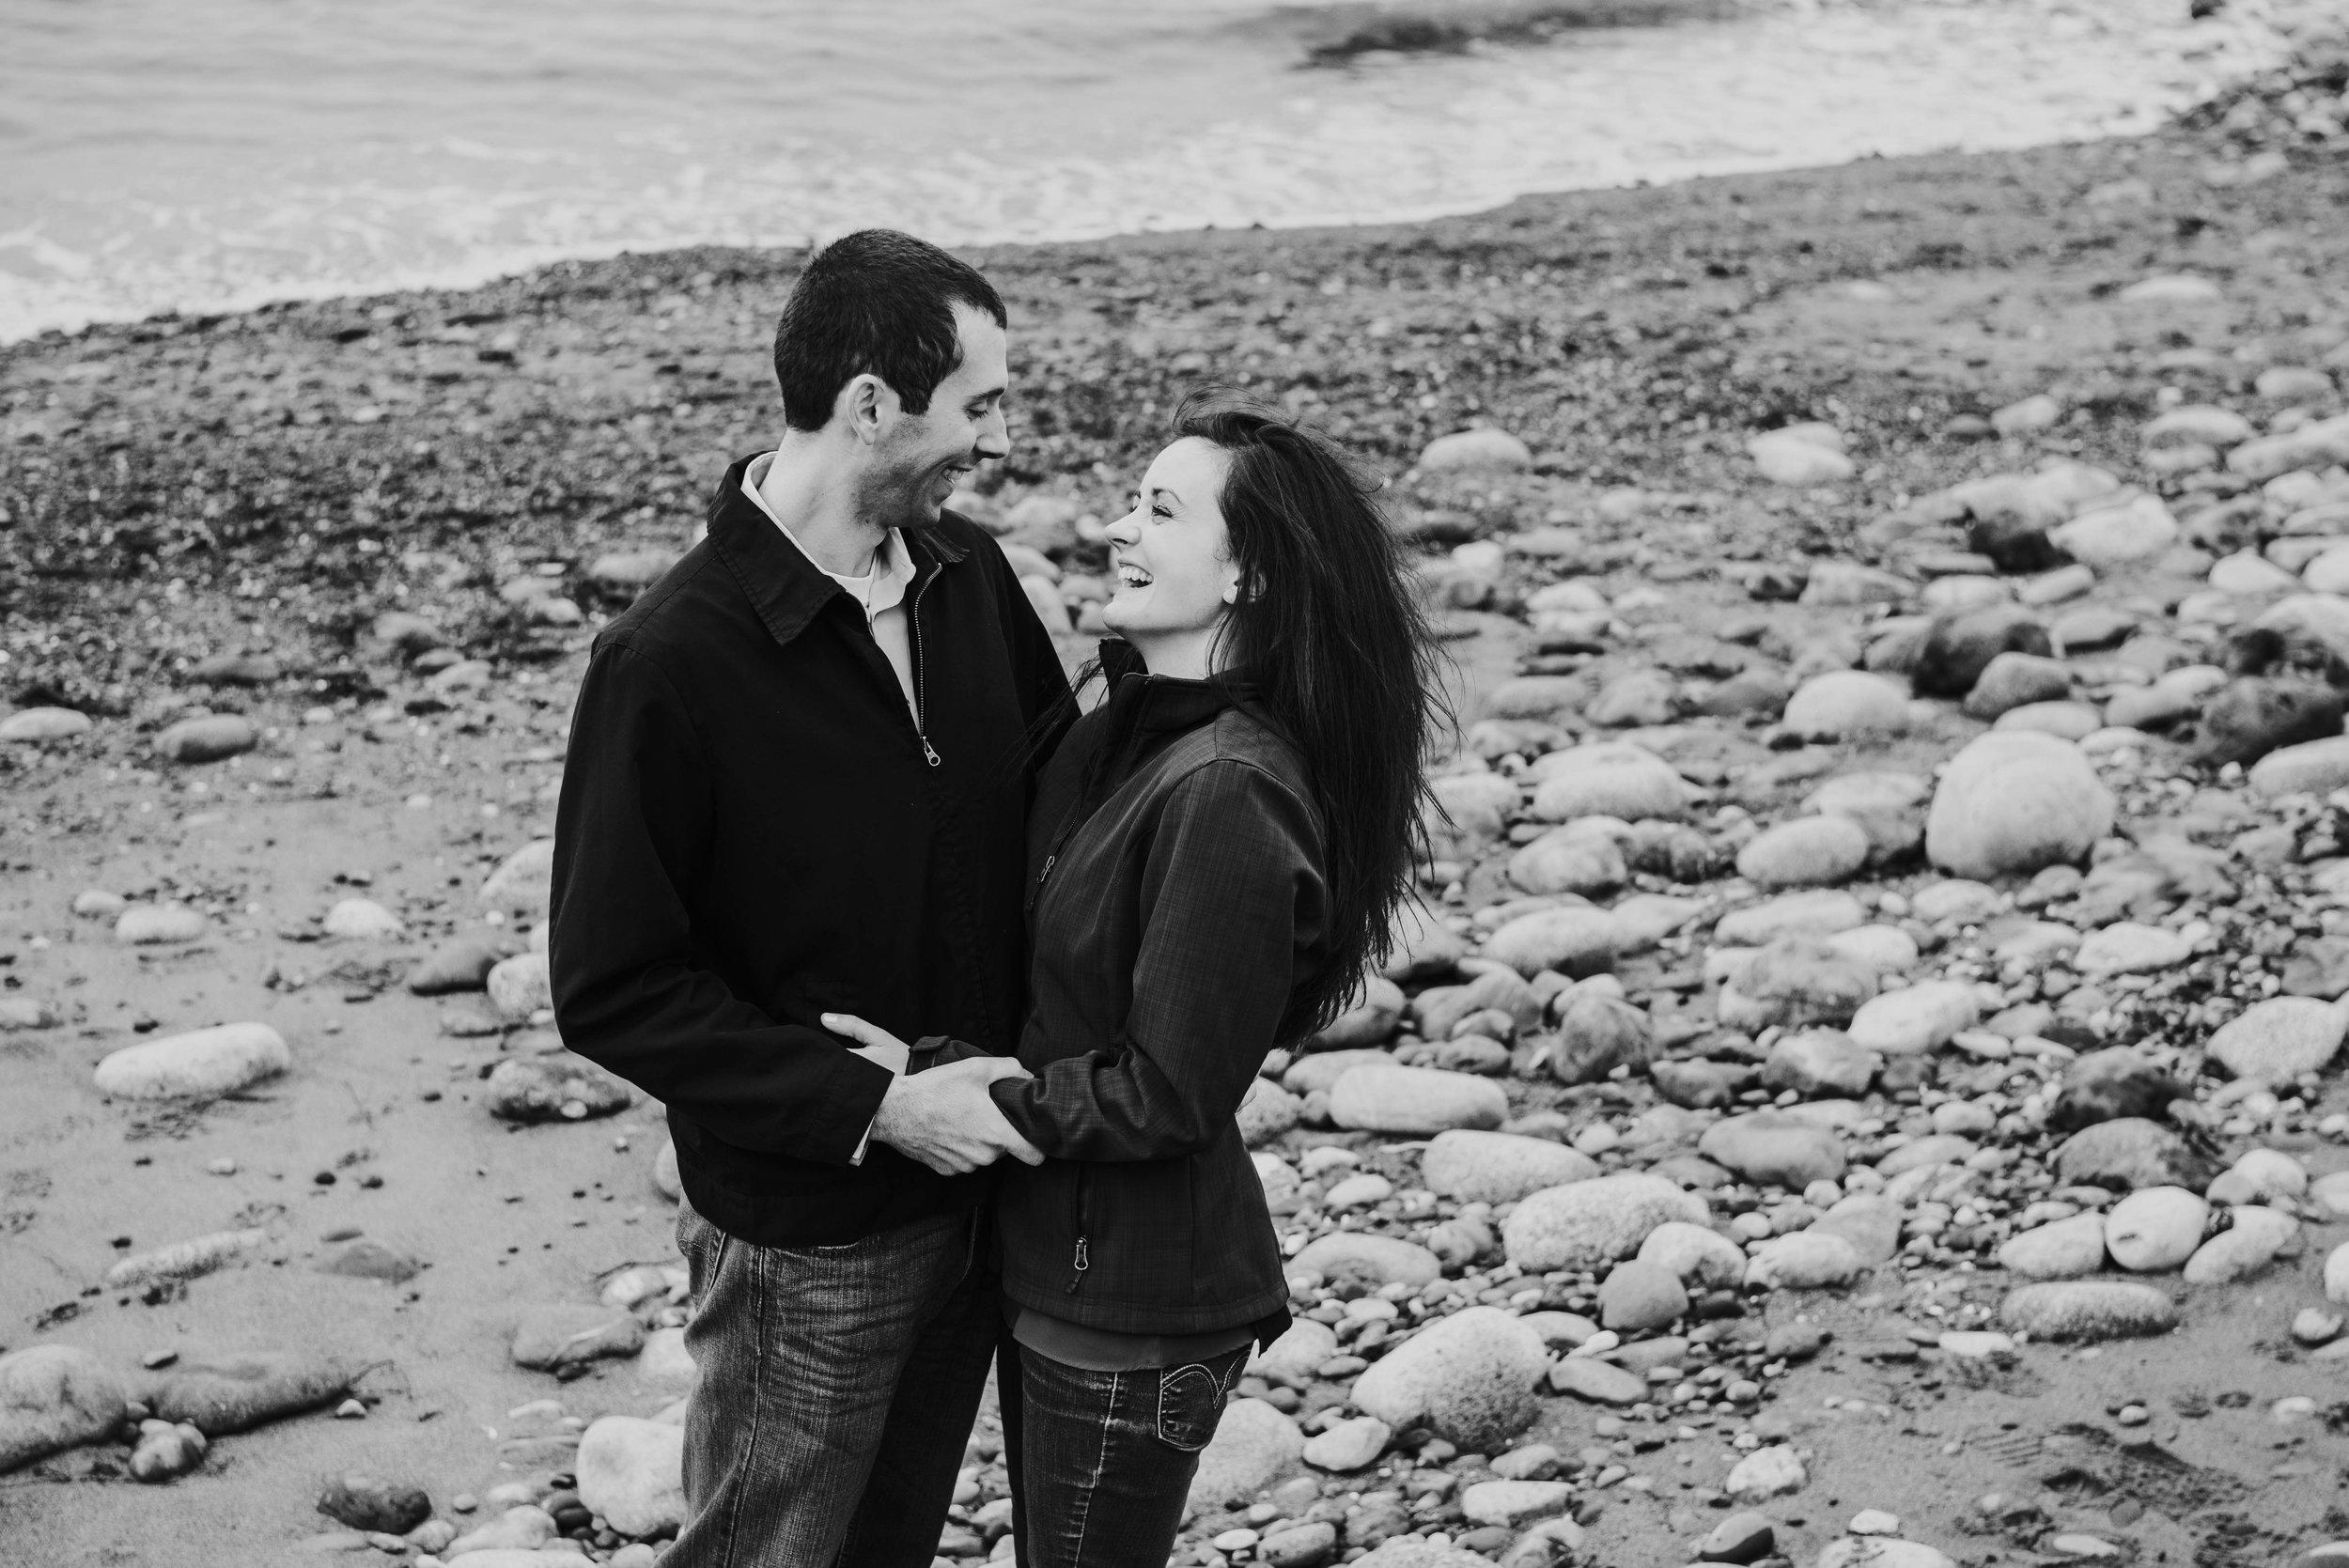 Oak-Harbor-Wedding-Photographer-J-Hodges (28 of 34).jpg